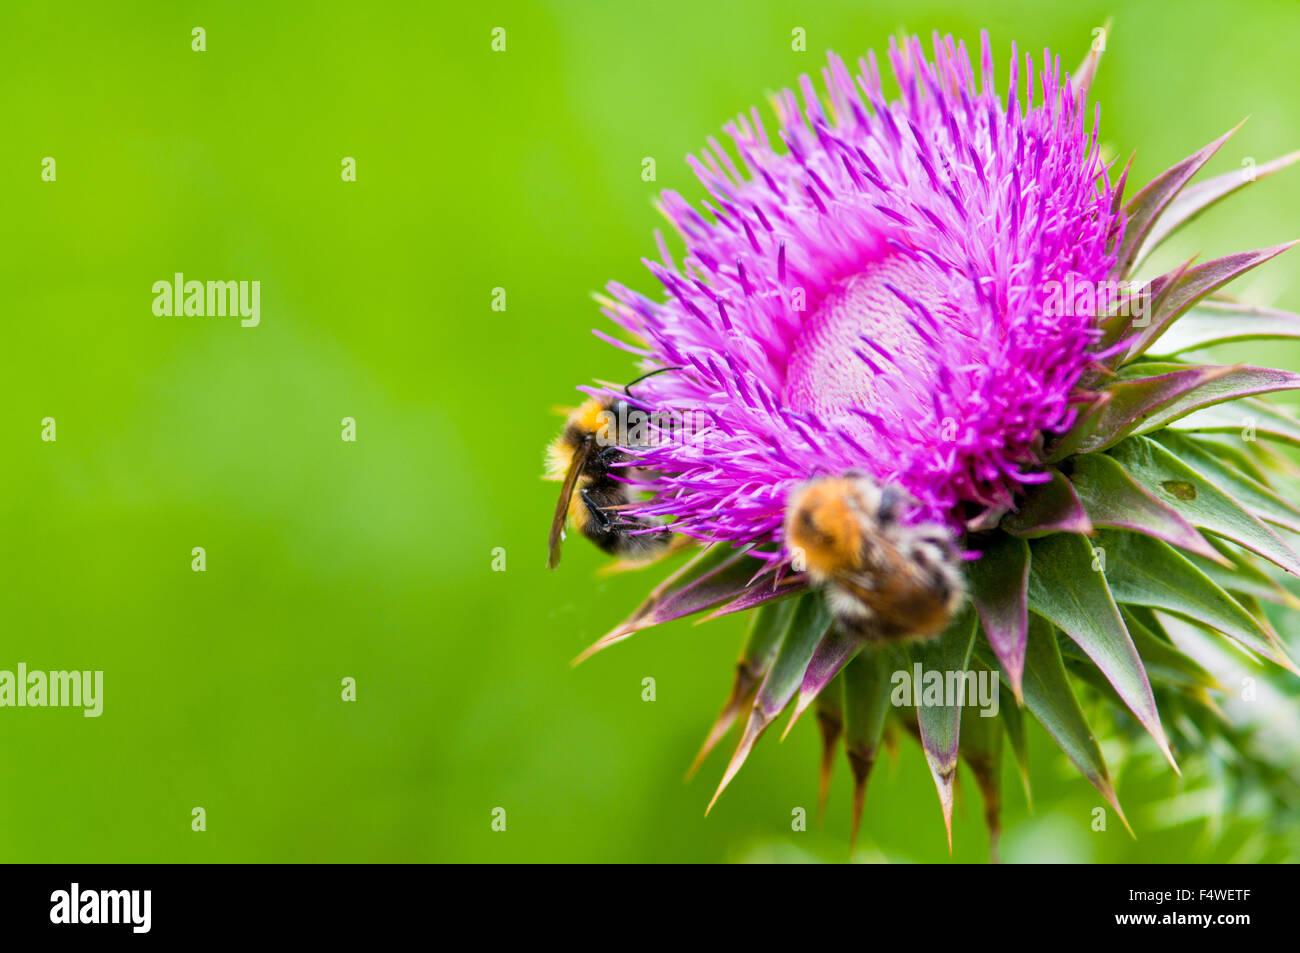 Antecedentes animal hermosa belleza biología de abejas blossom close-up closeup recolectando flora campo colorido Imagen De Stock